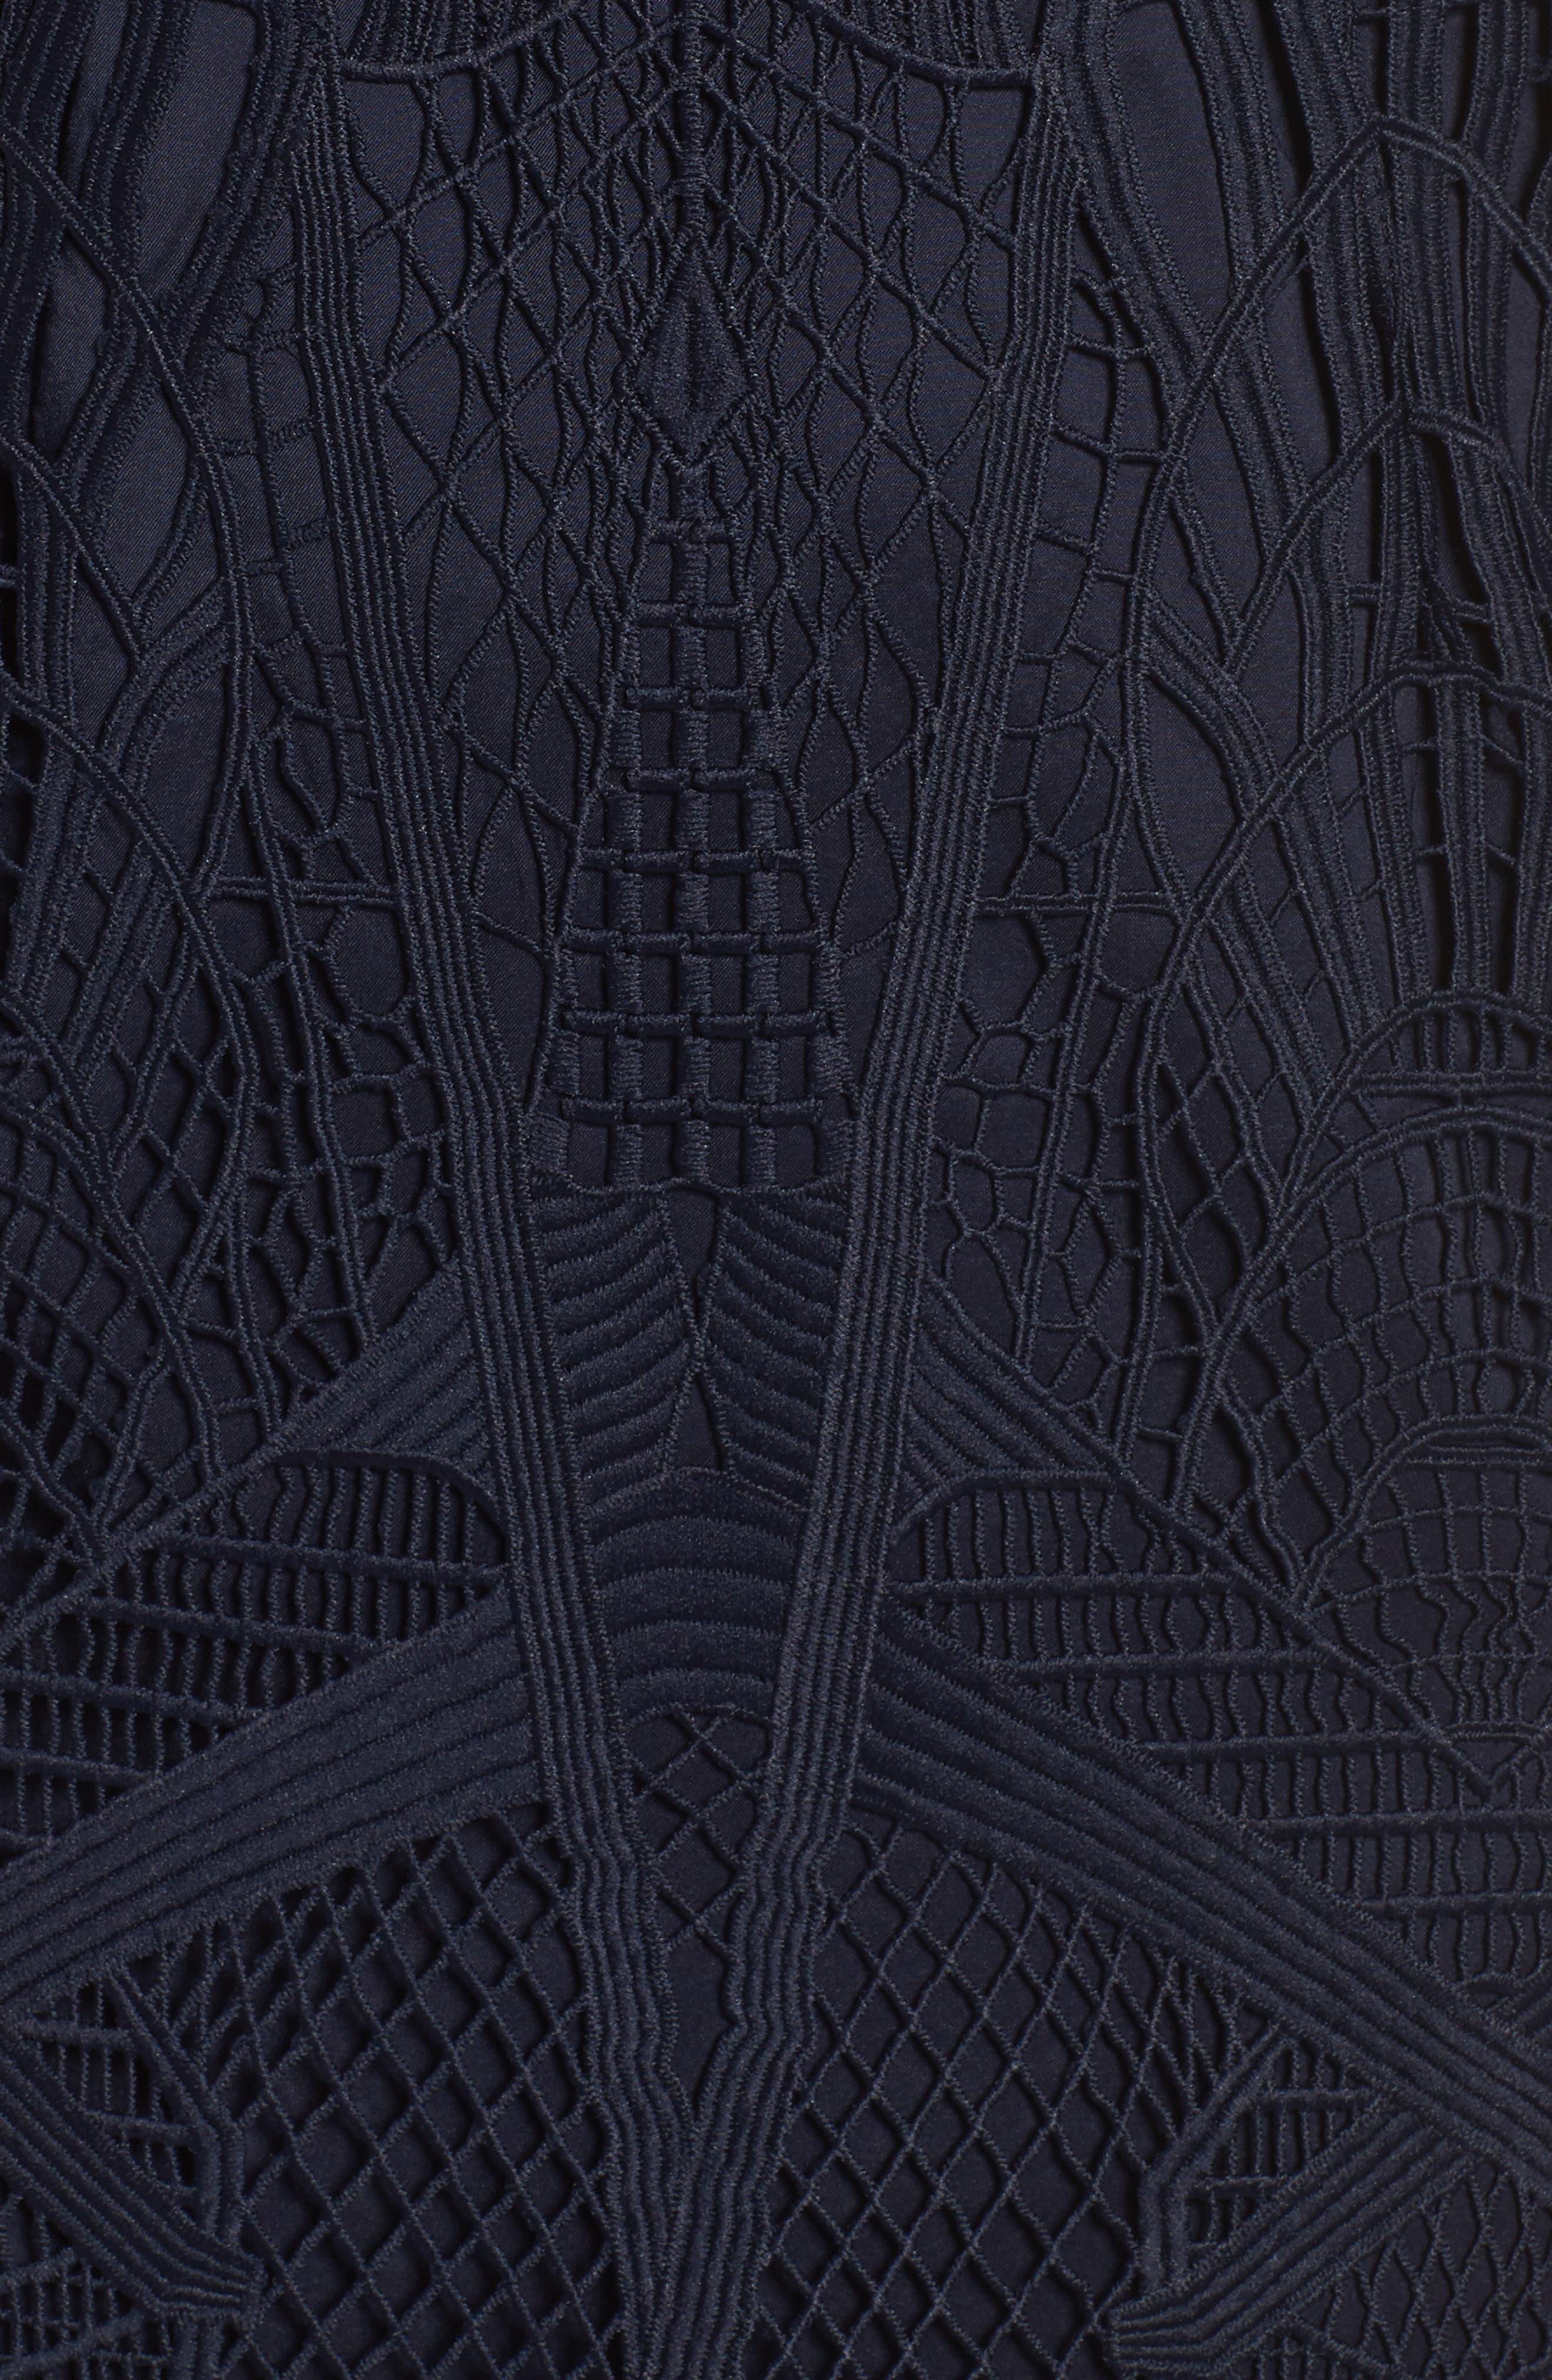 Illusion Lace Sheath Dress,                             Alternate thumbnail 5, color,                             417